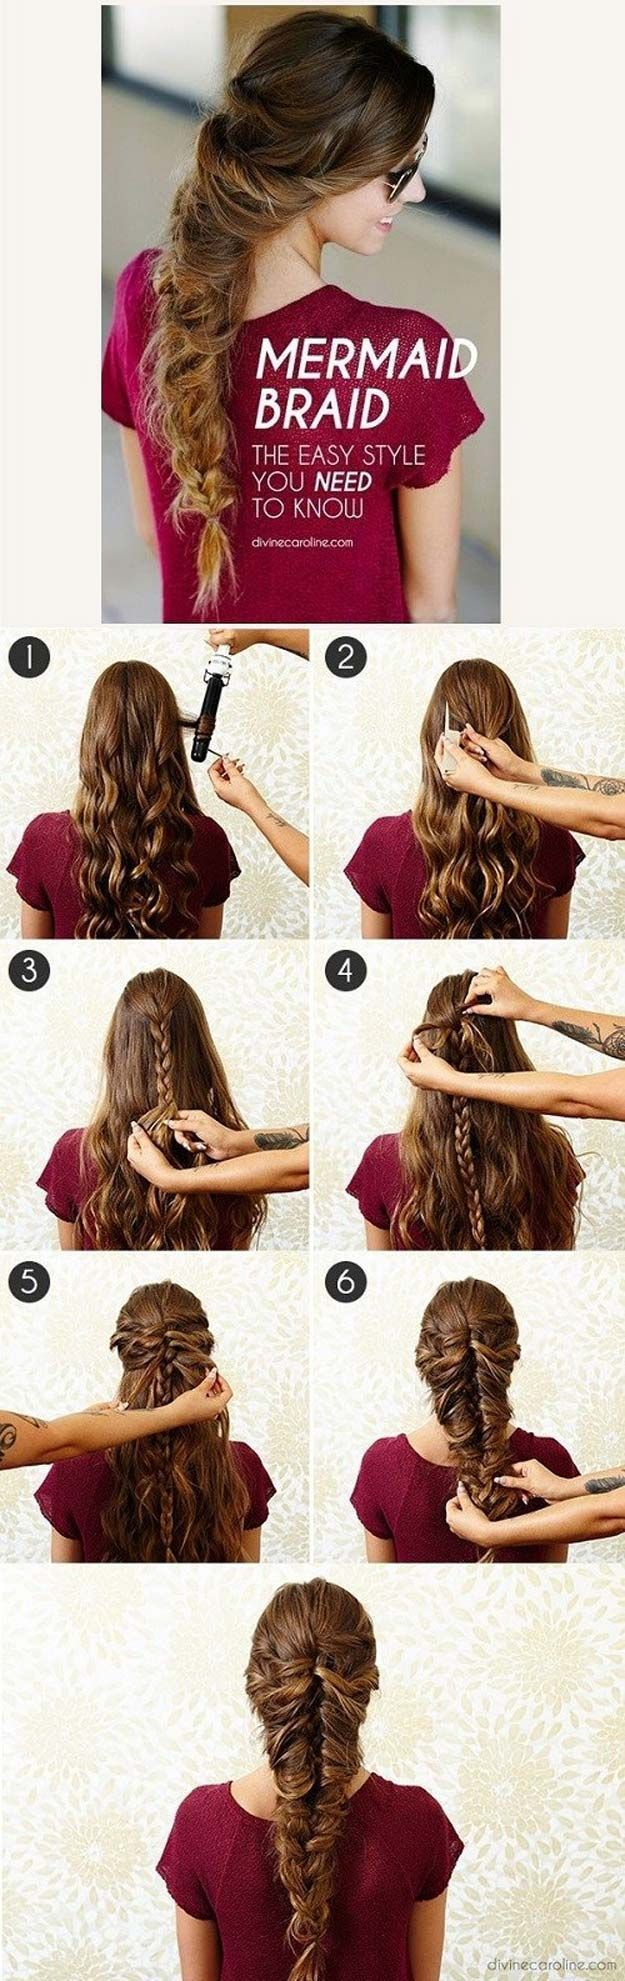 Best Hair Braiding Tutorials - Mermaid Braid - Easy Step by Step Tutorials for B...